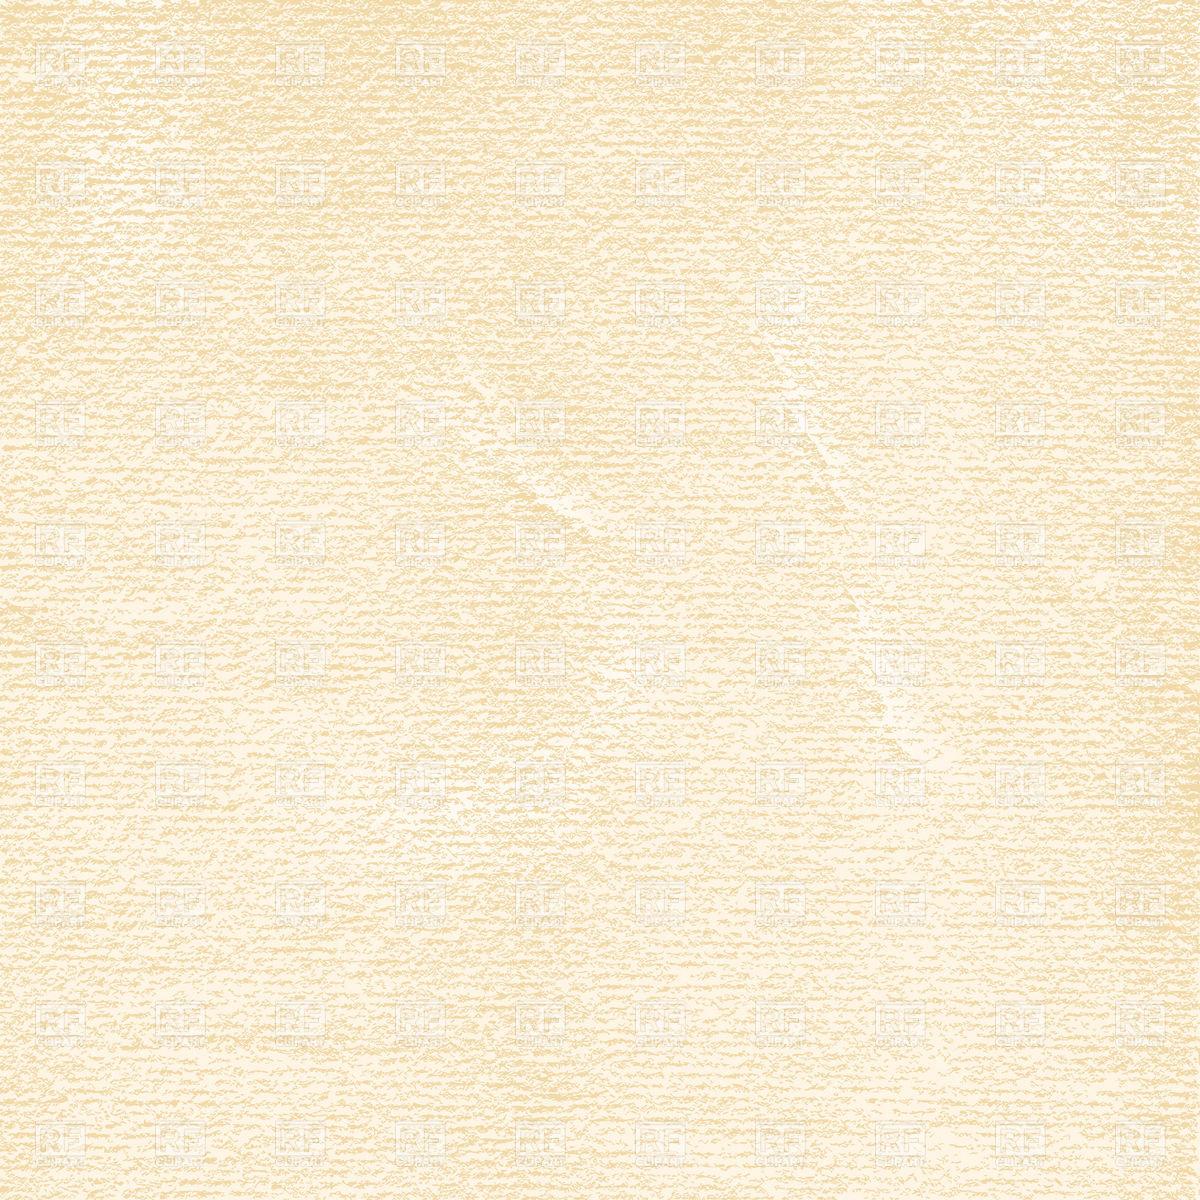 50 Free Textured Paper Wallpaper Clipart On Wallpapersafari